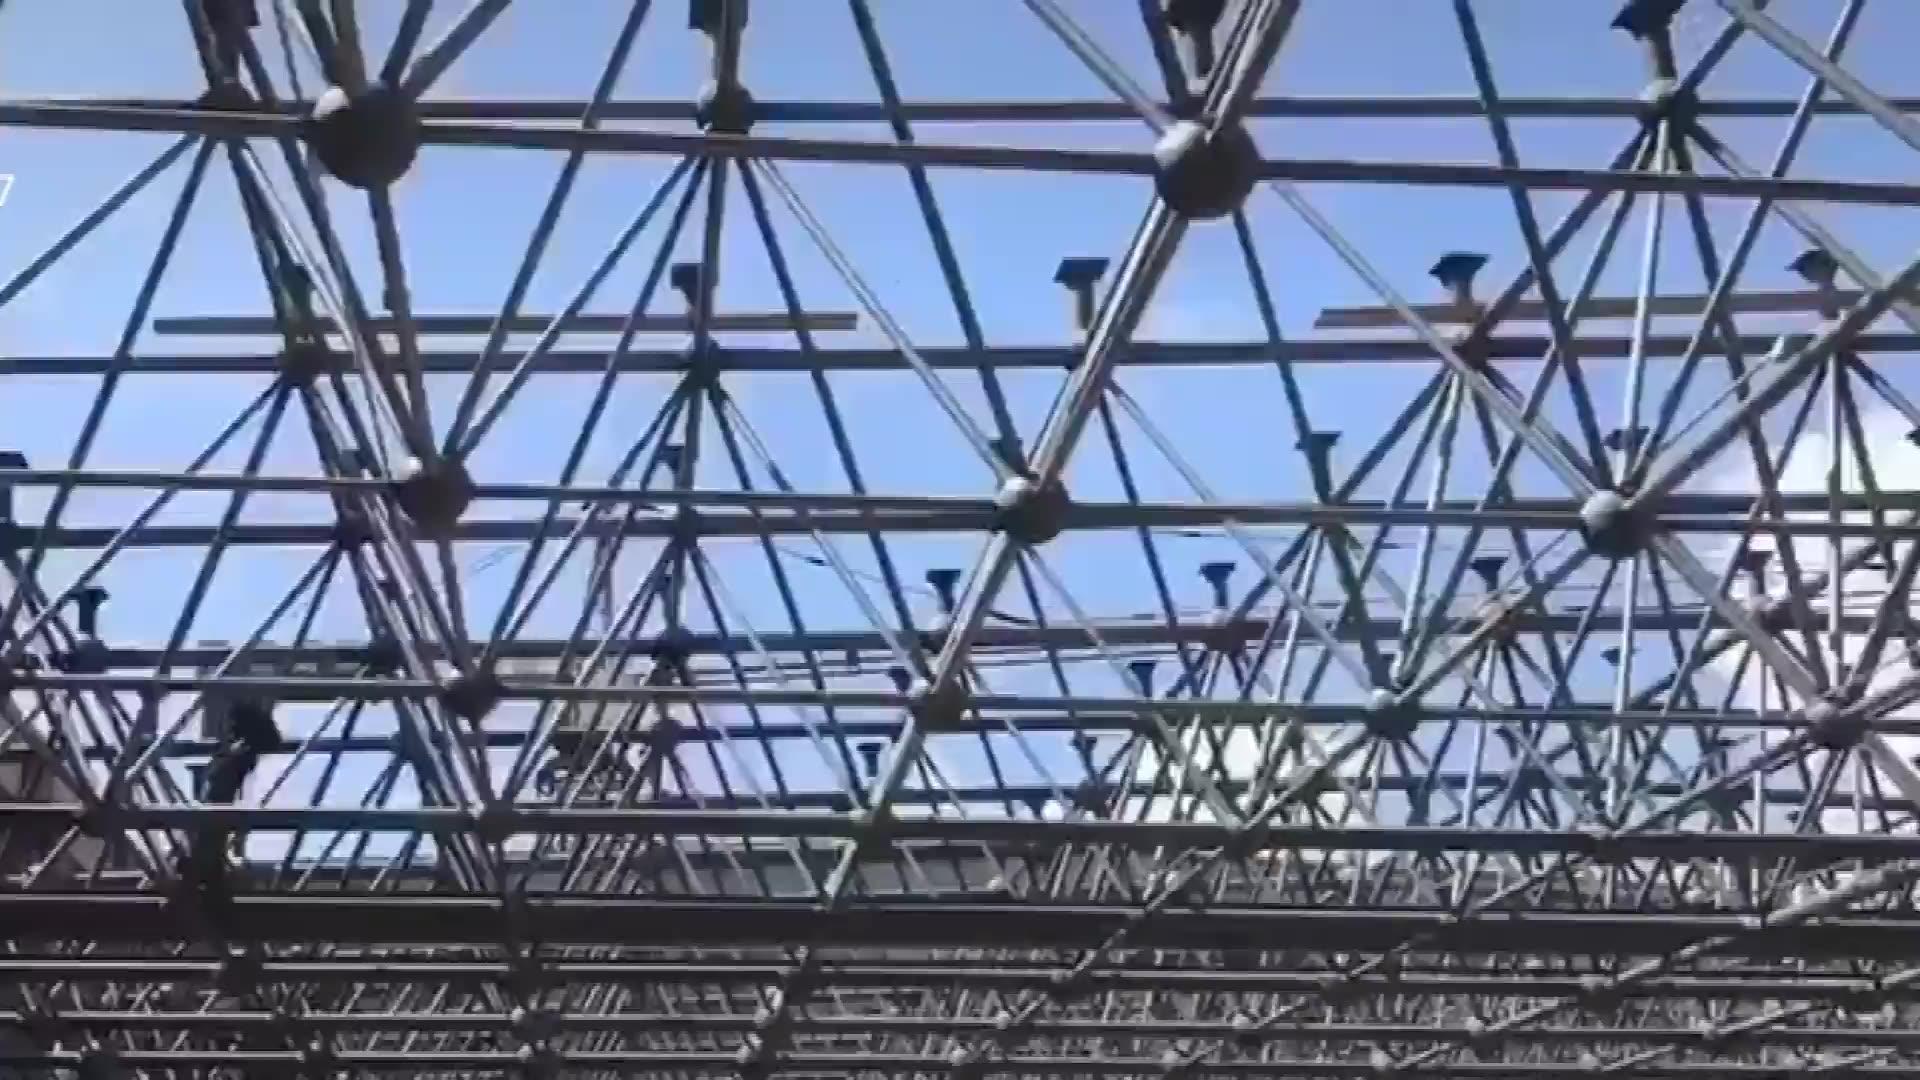 Safs現代プレハブ軟鋼構造建物プレハブ倉庫ワークショップ航空機格納庫